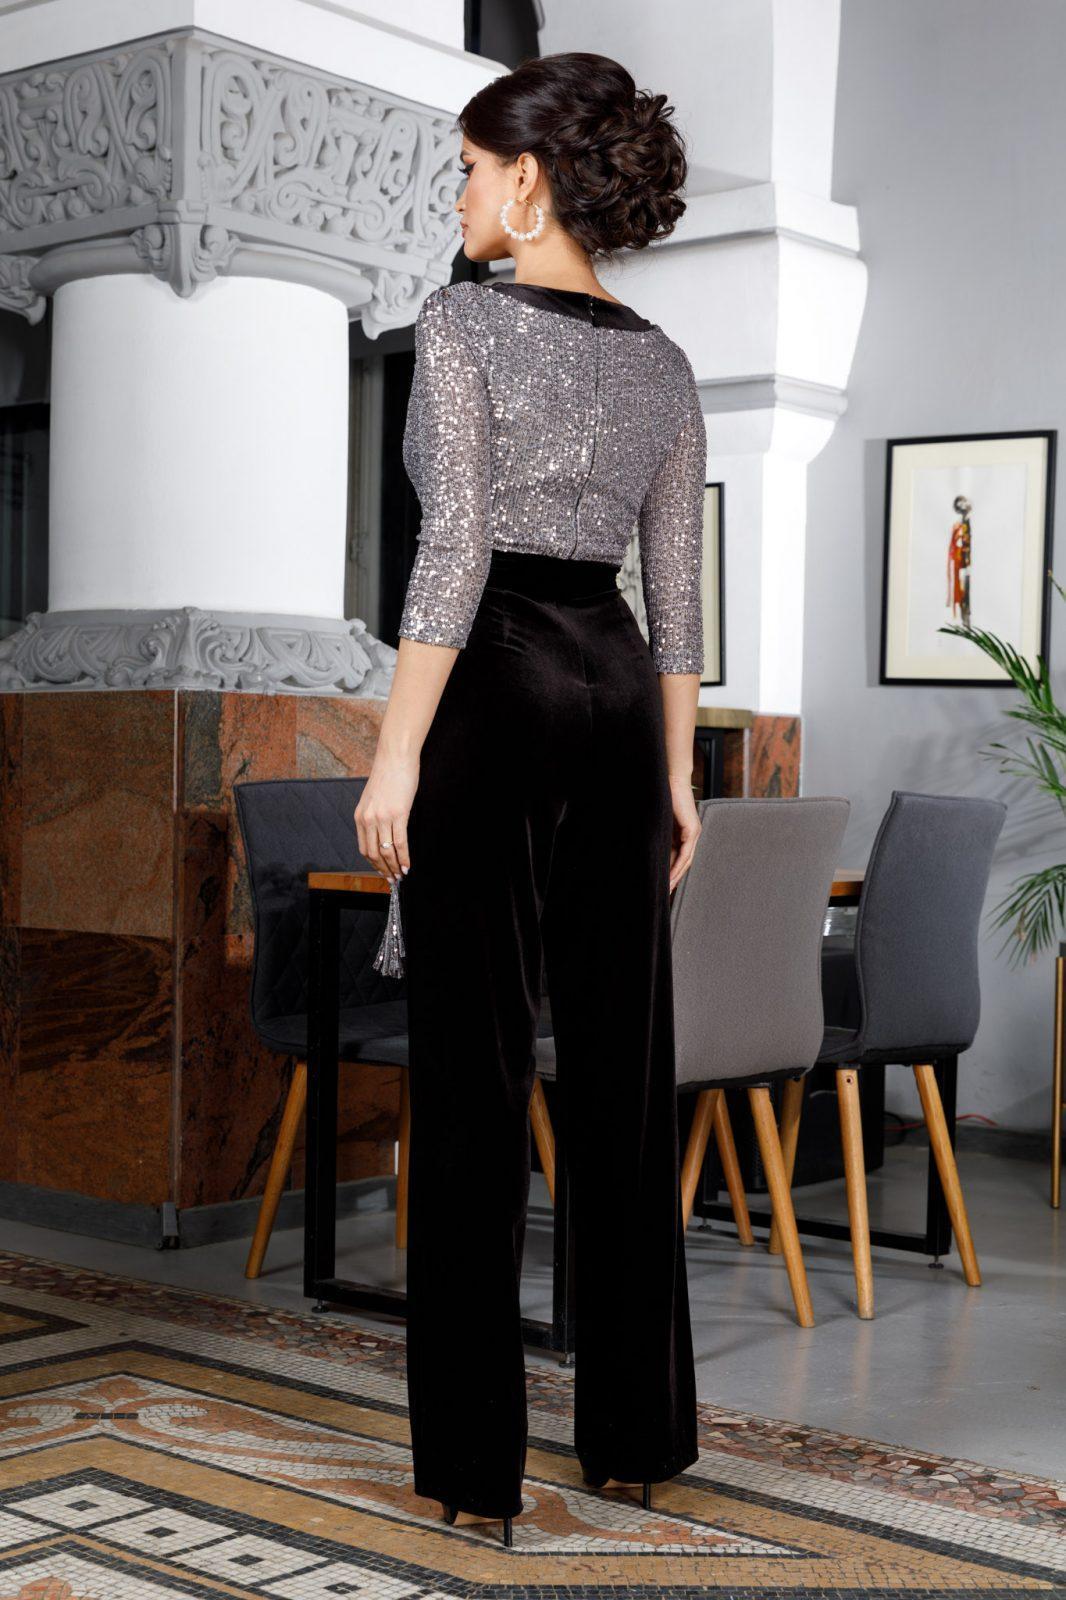 Anastasia Ολόσωμη Φόρμα 5973